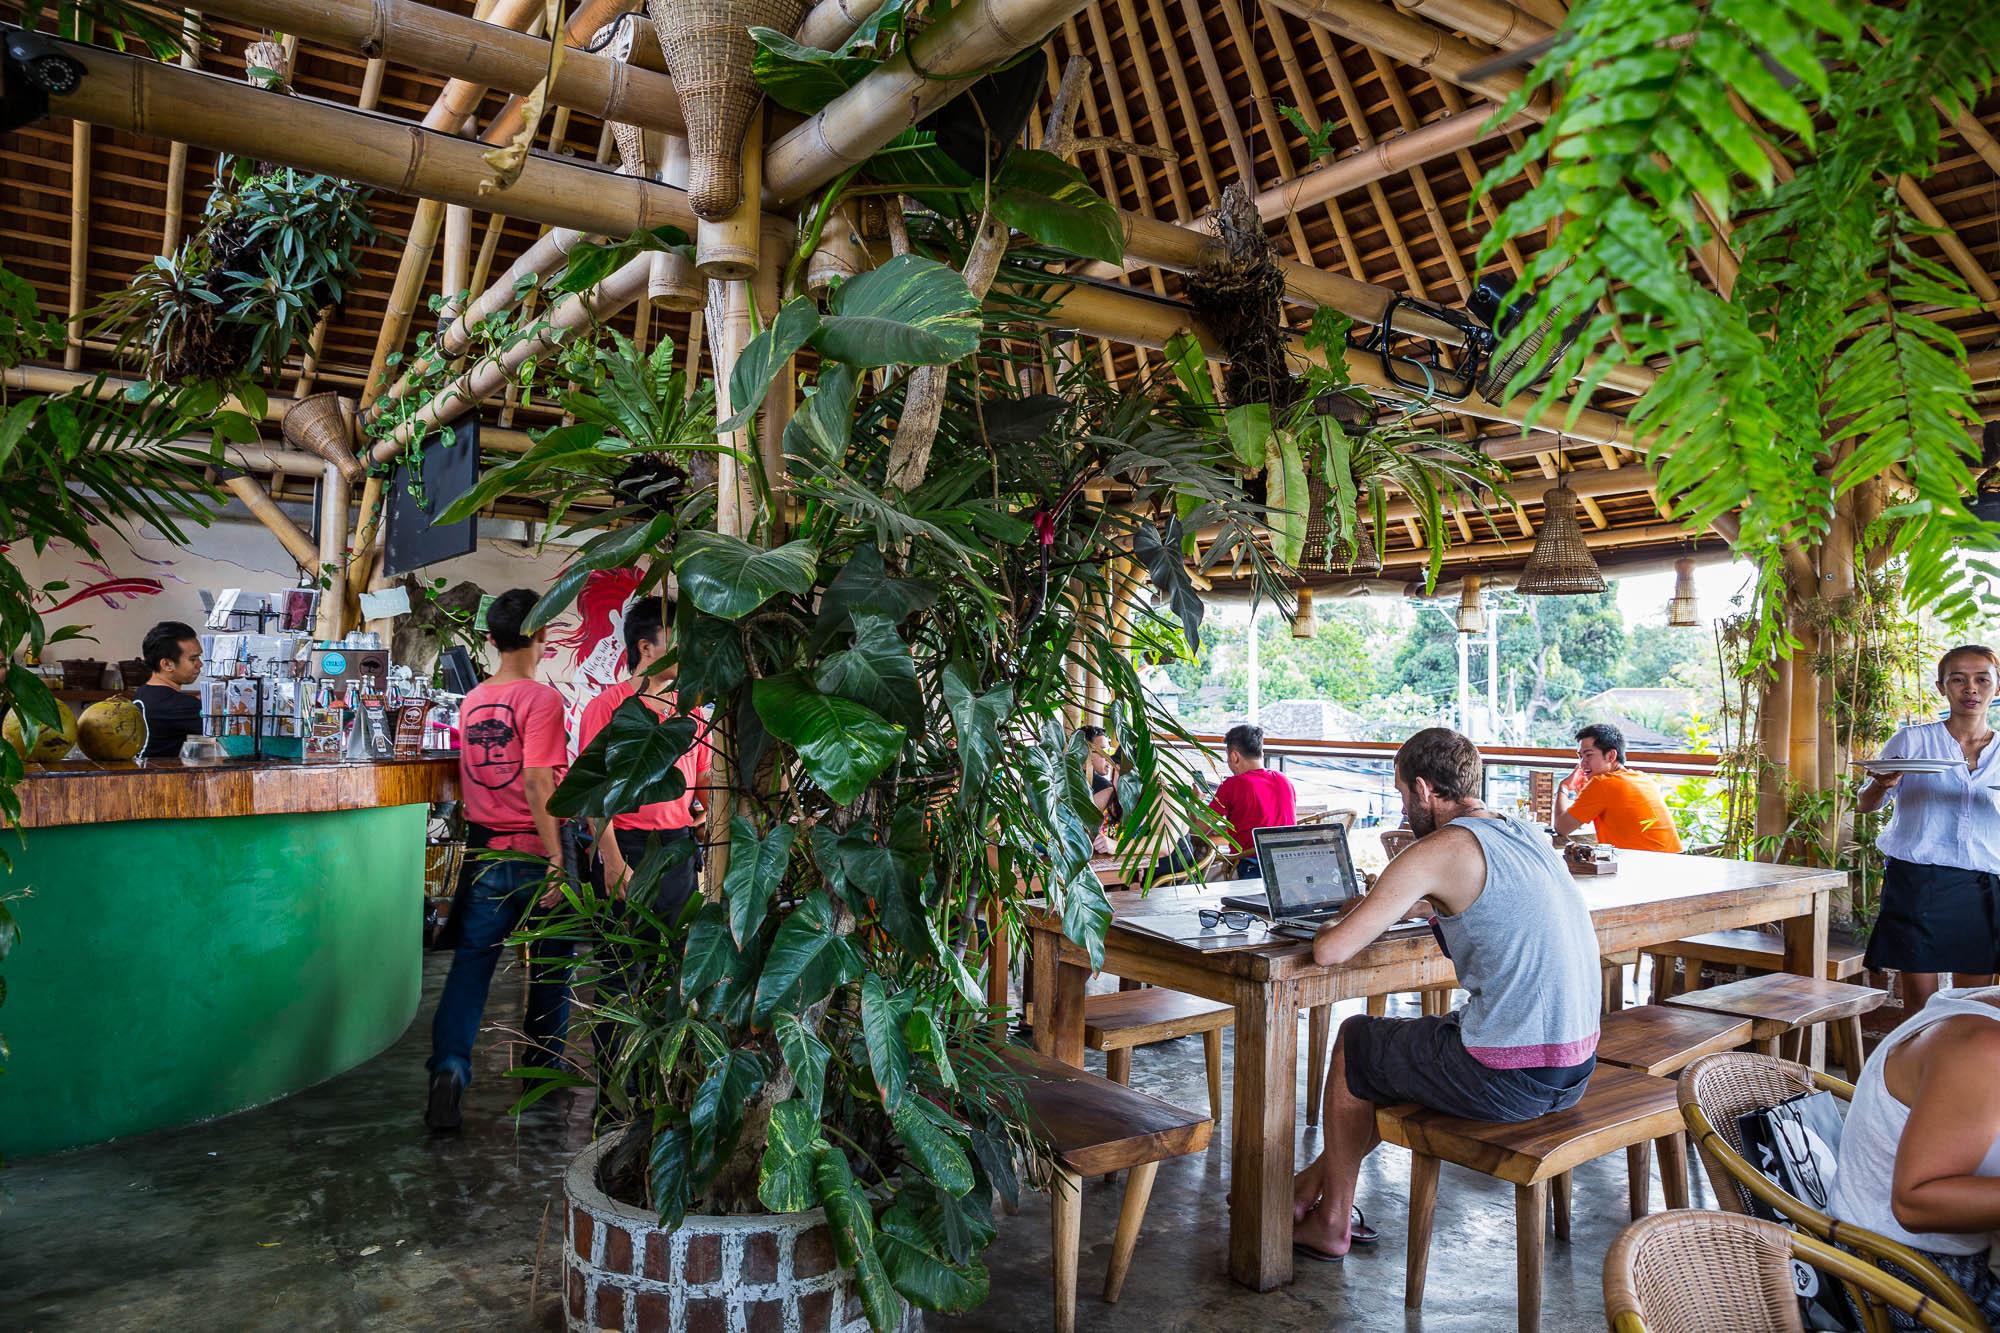 Bali - Travel tips - www.jusmedic.com